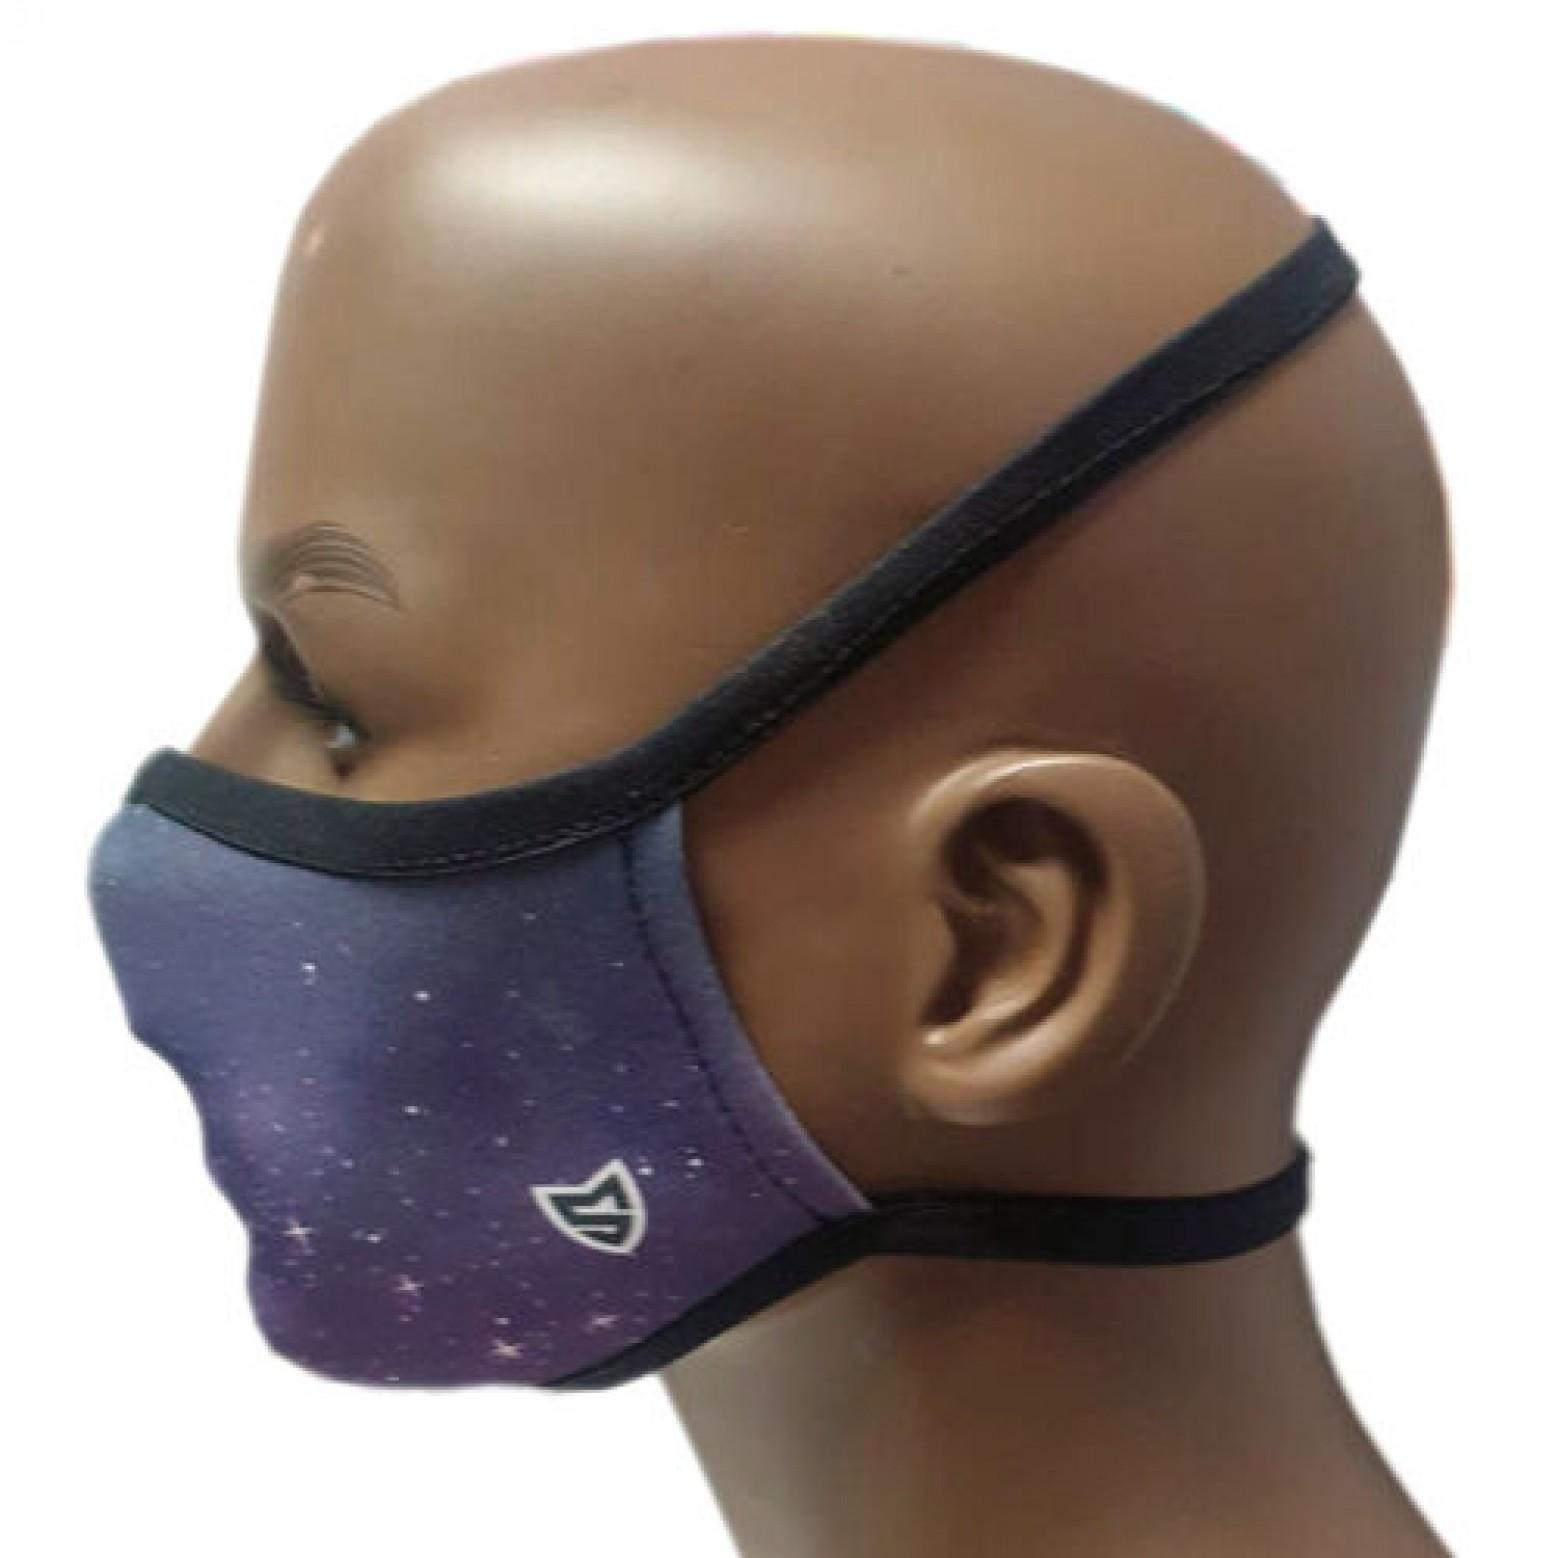 Herbruikbaar mondkapje Game over volwassene star mask